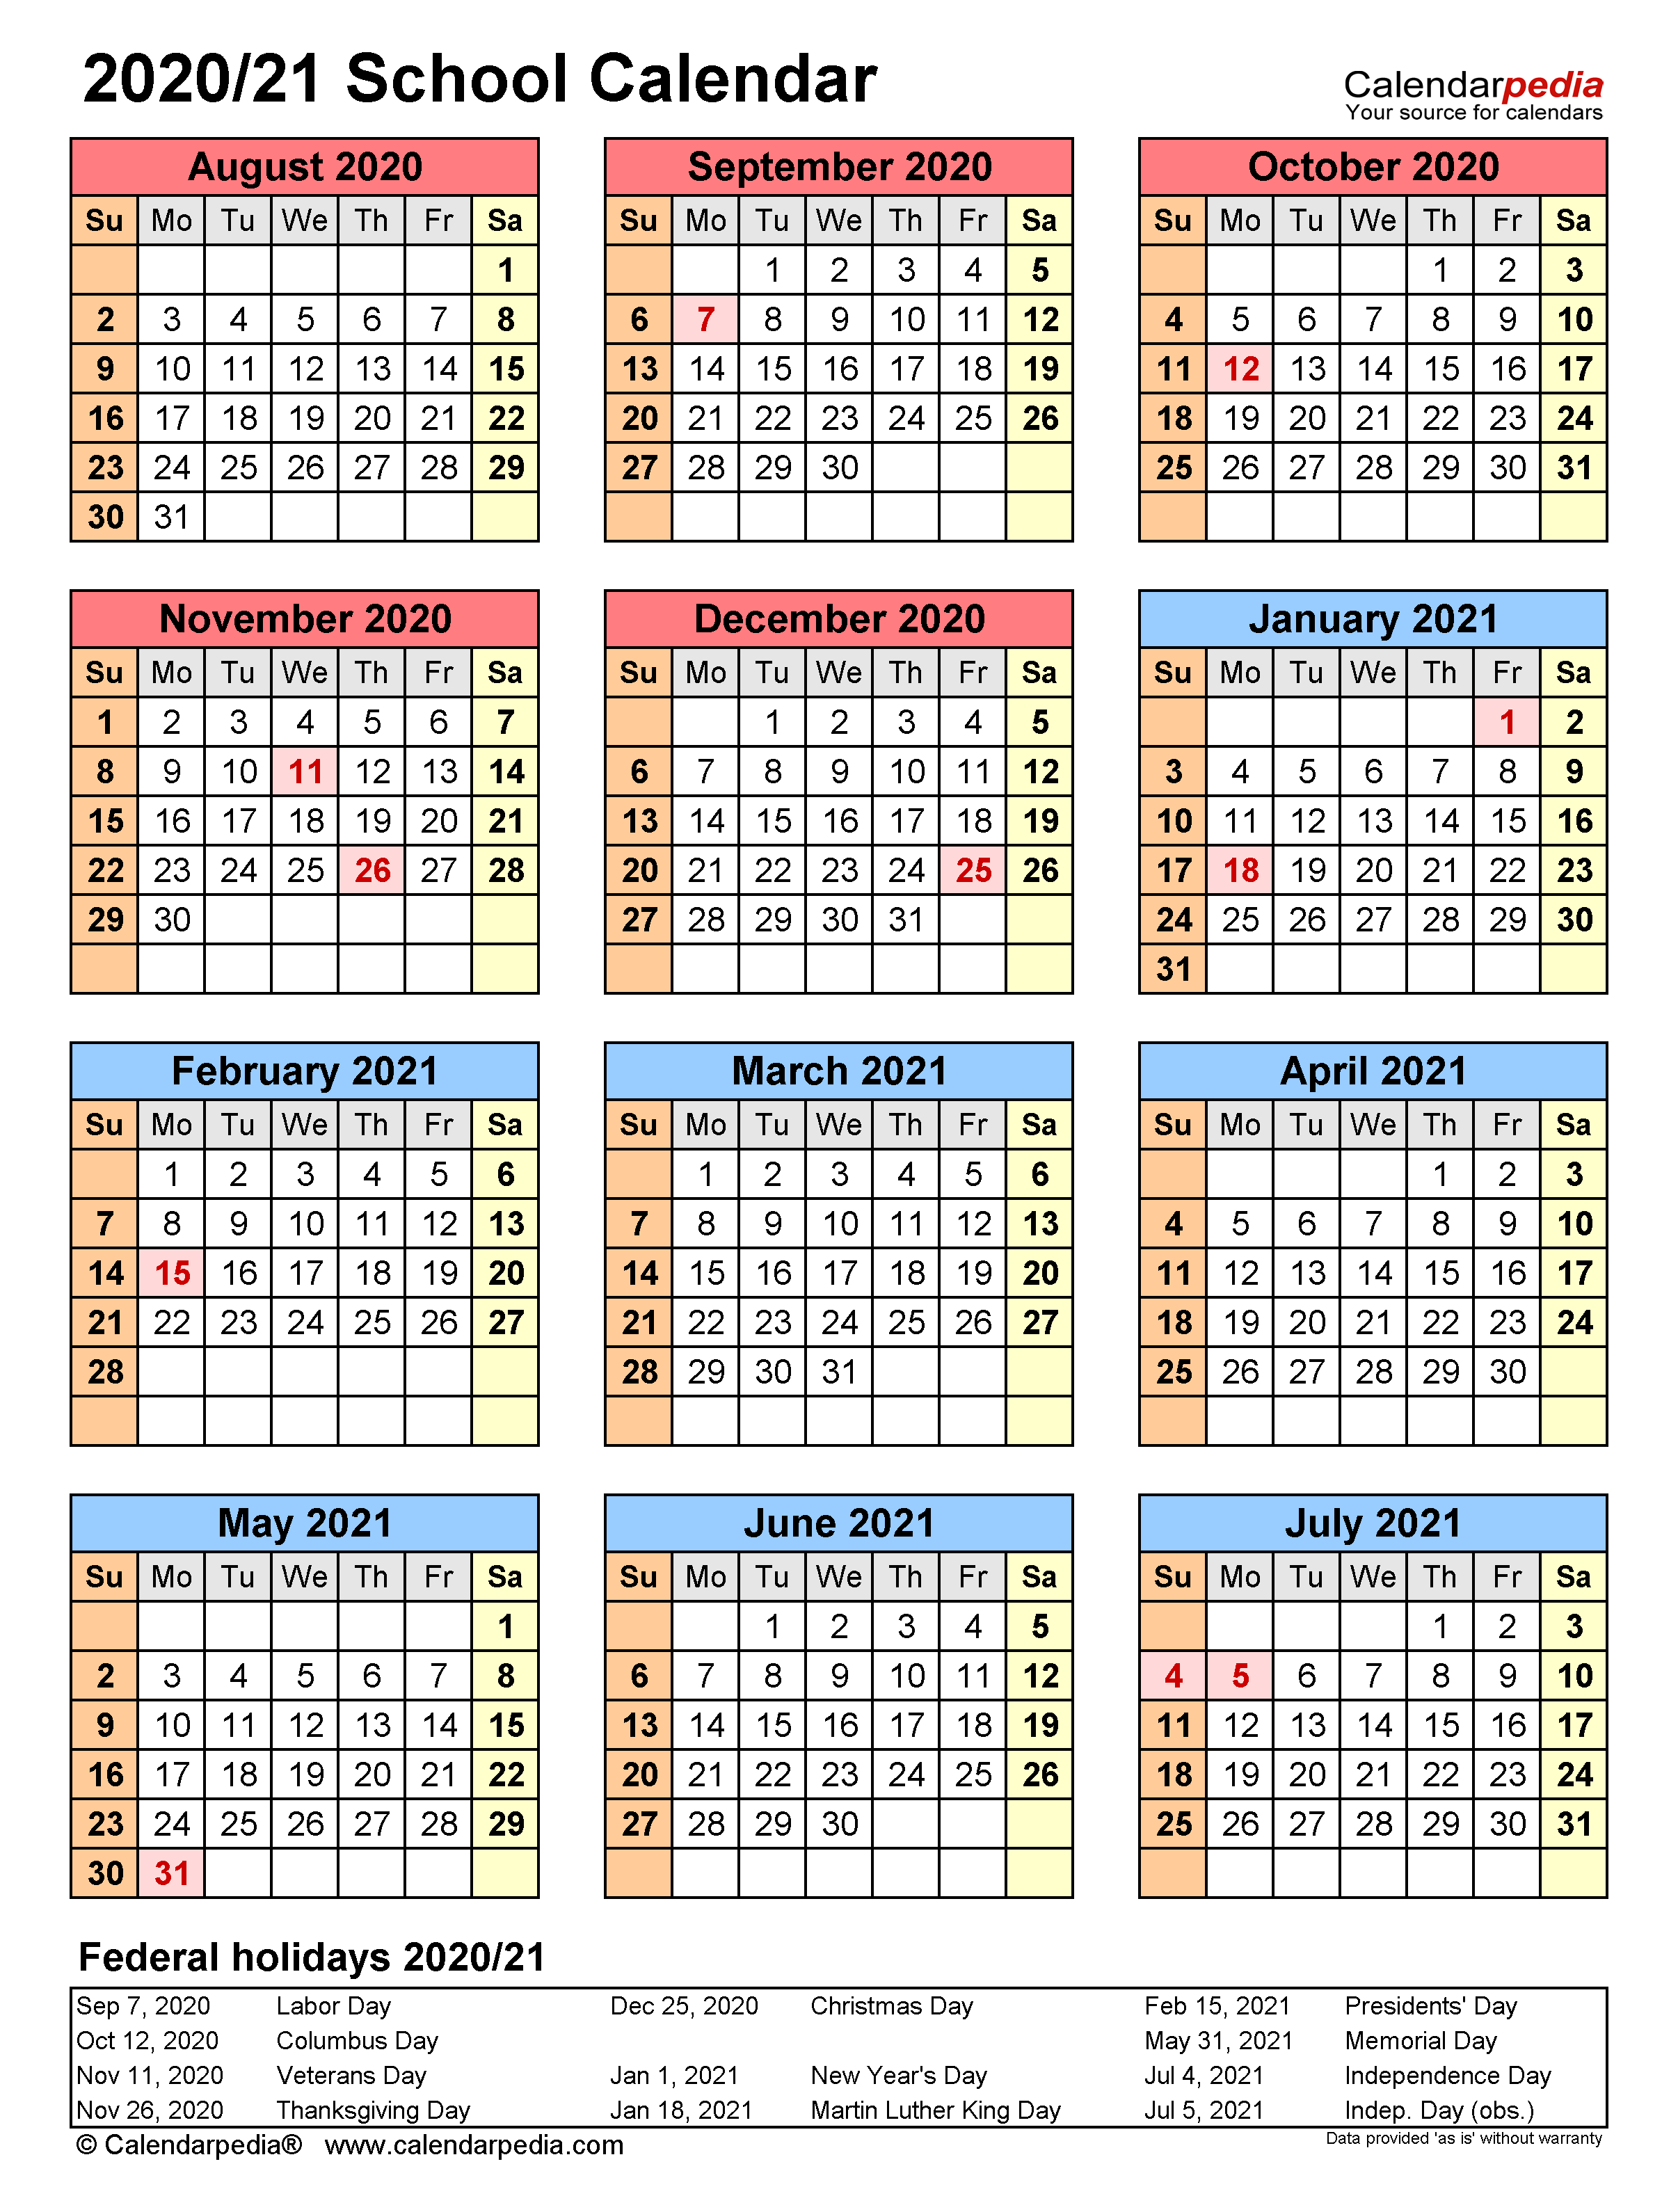 School Calendars 2020/2021 - Free Printable Word Templates In Printable 2020 2021 School Calendar